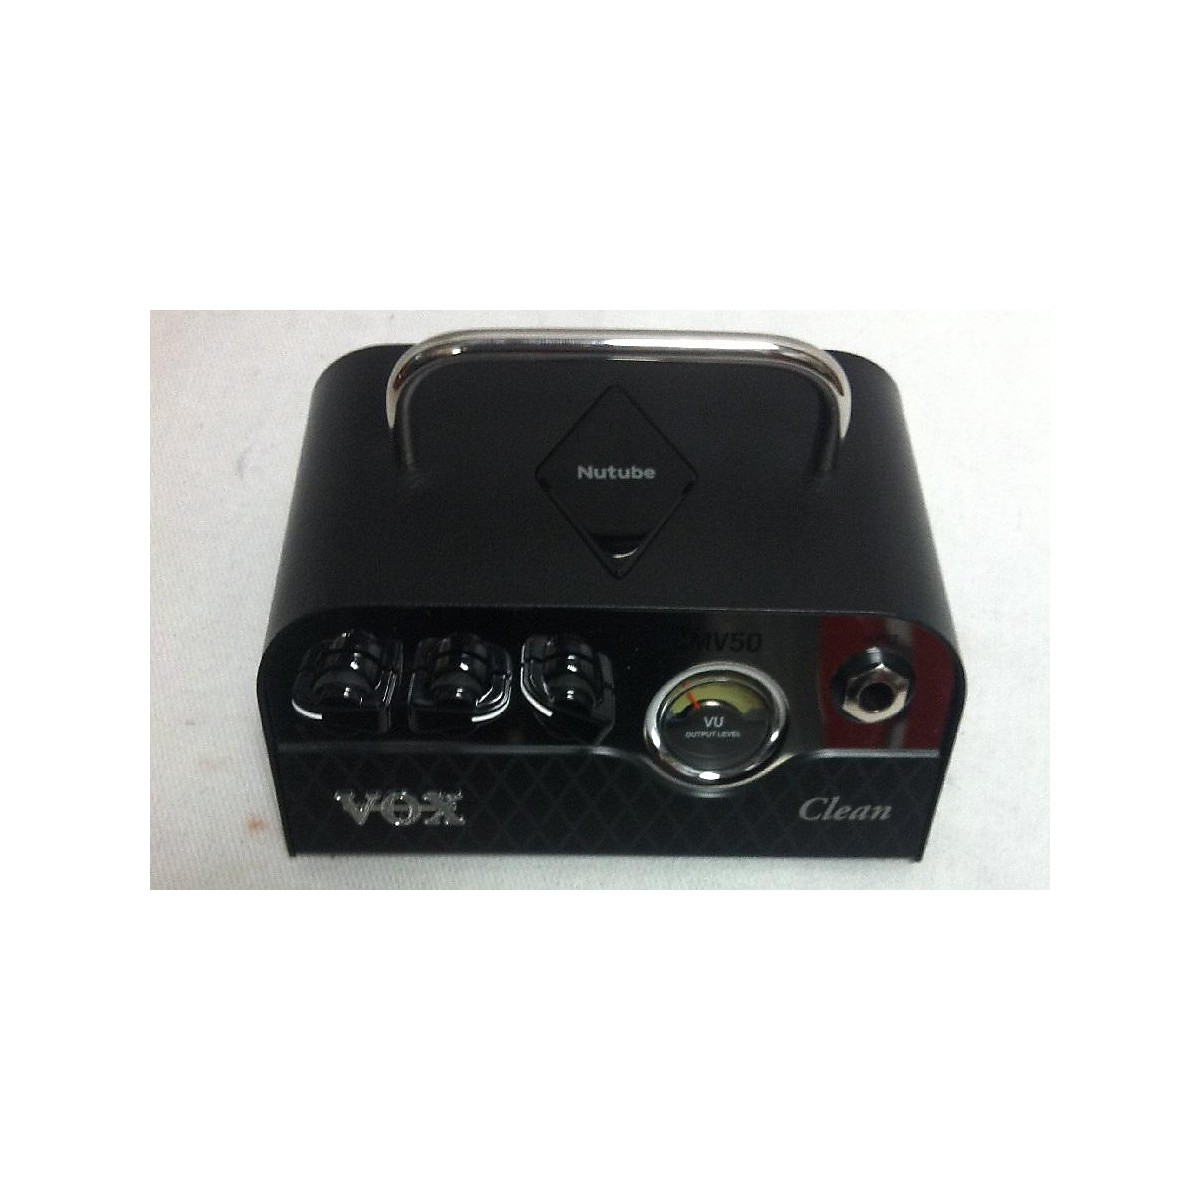 Vox MV50 CLEAN Solid State Guitar Amp Head